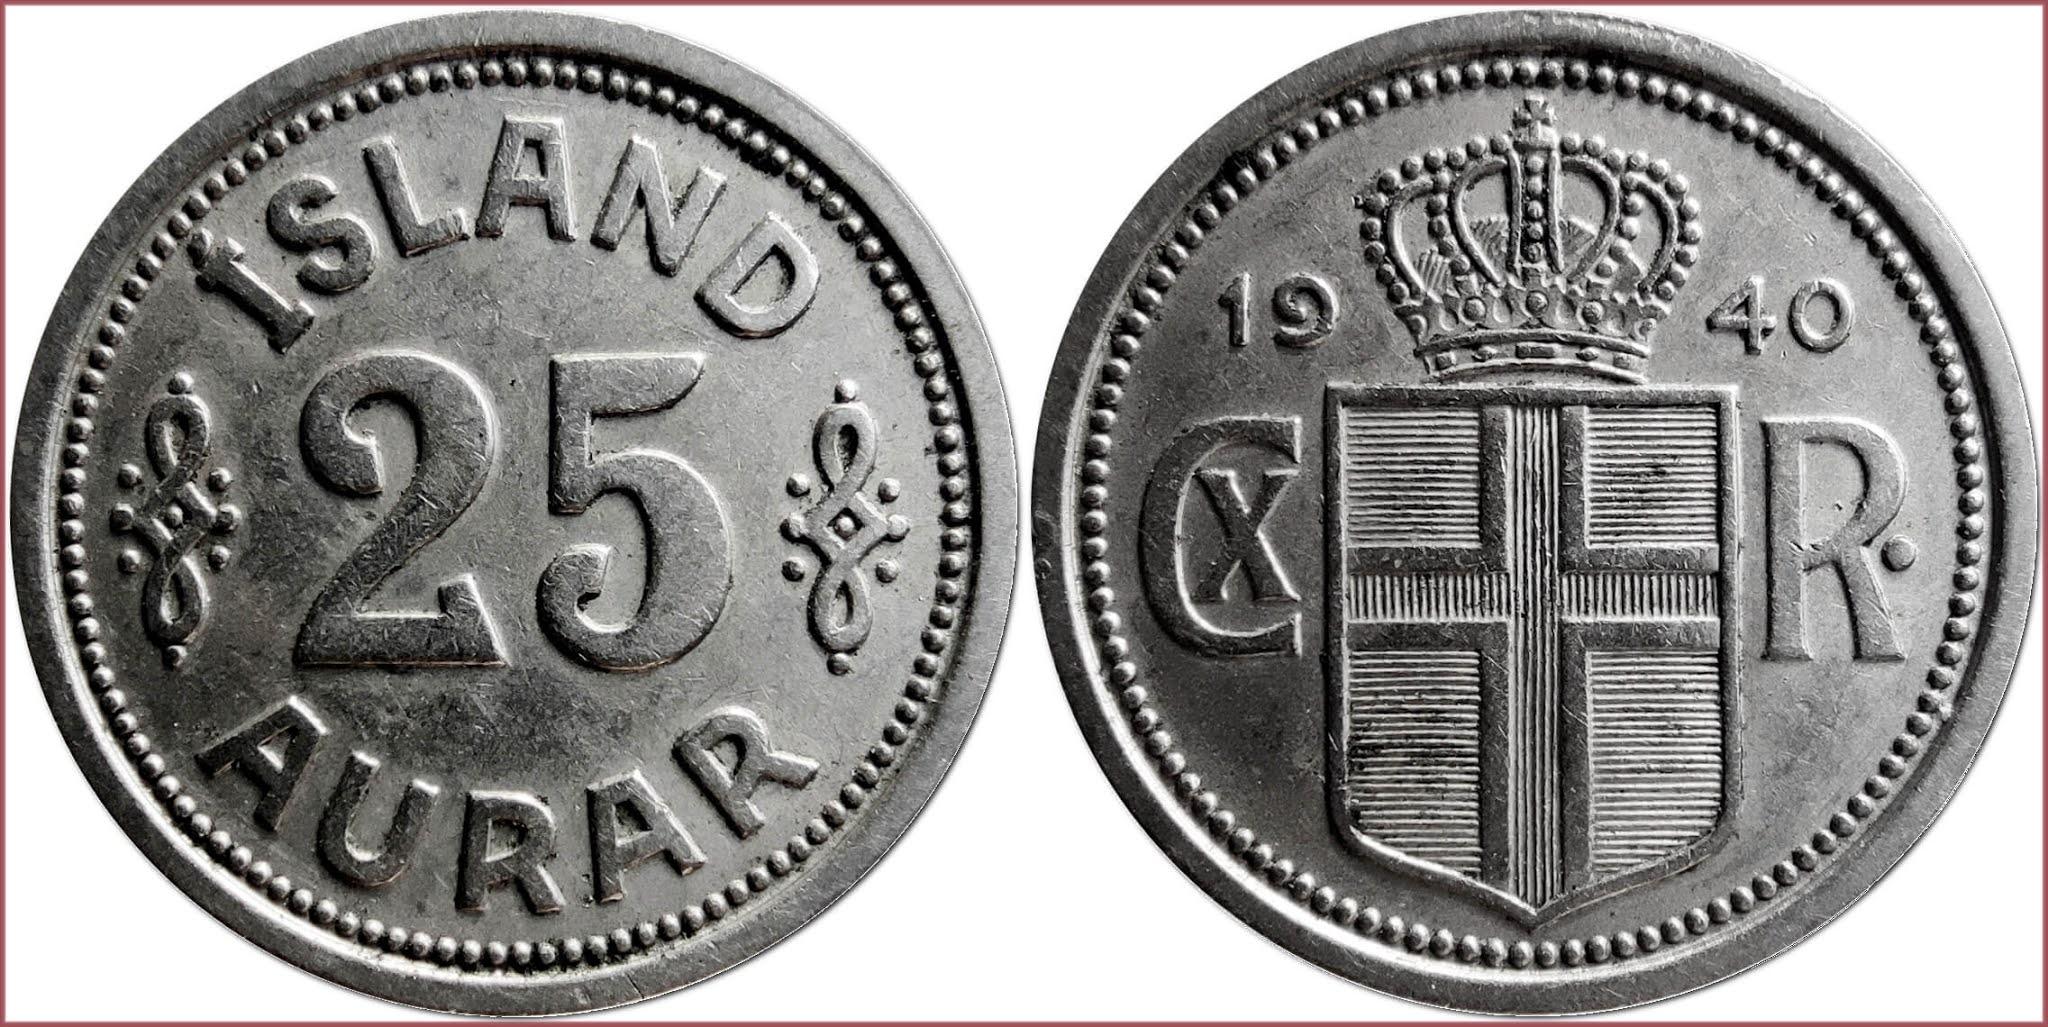 25 aurar, 1940: Iceland